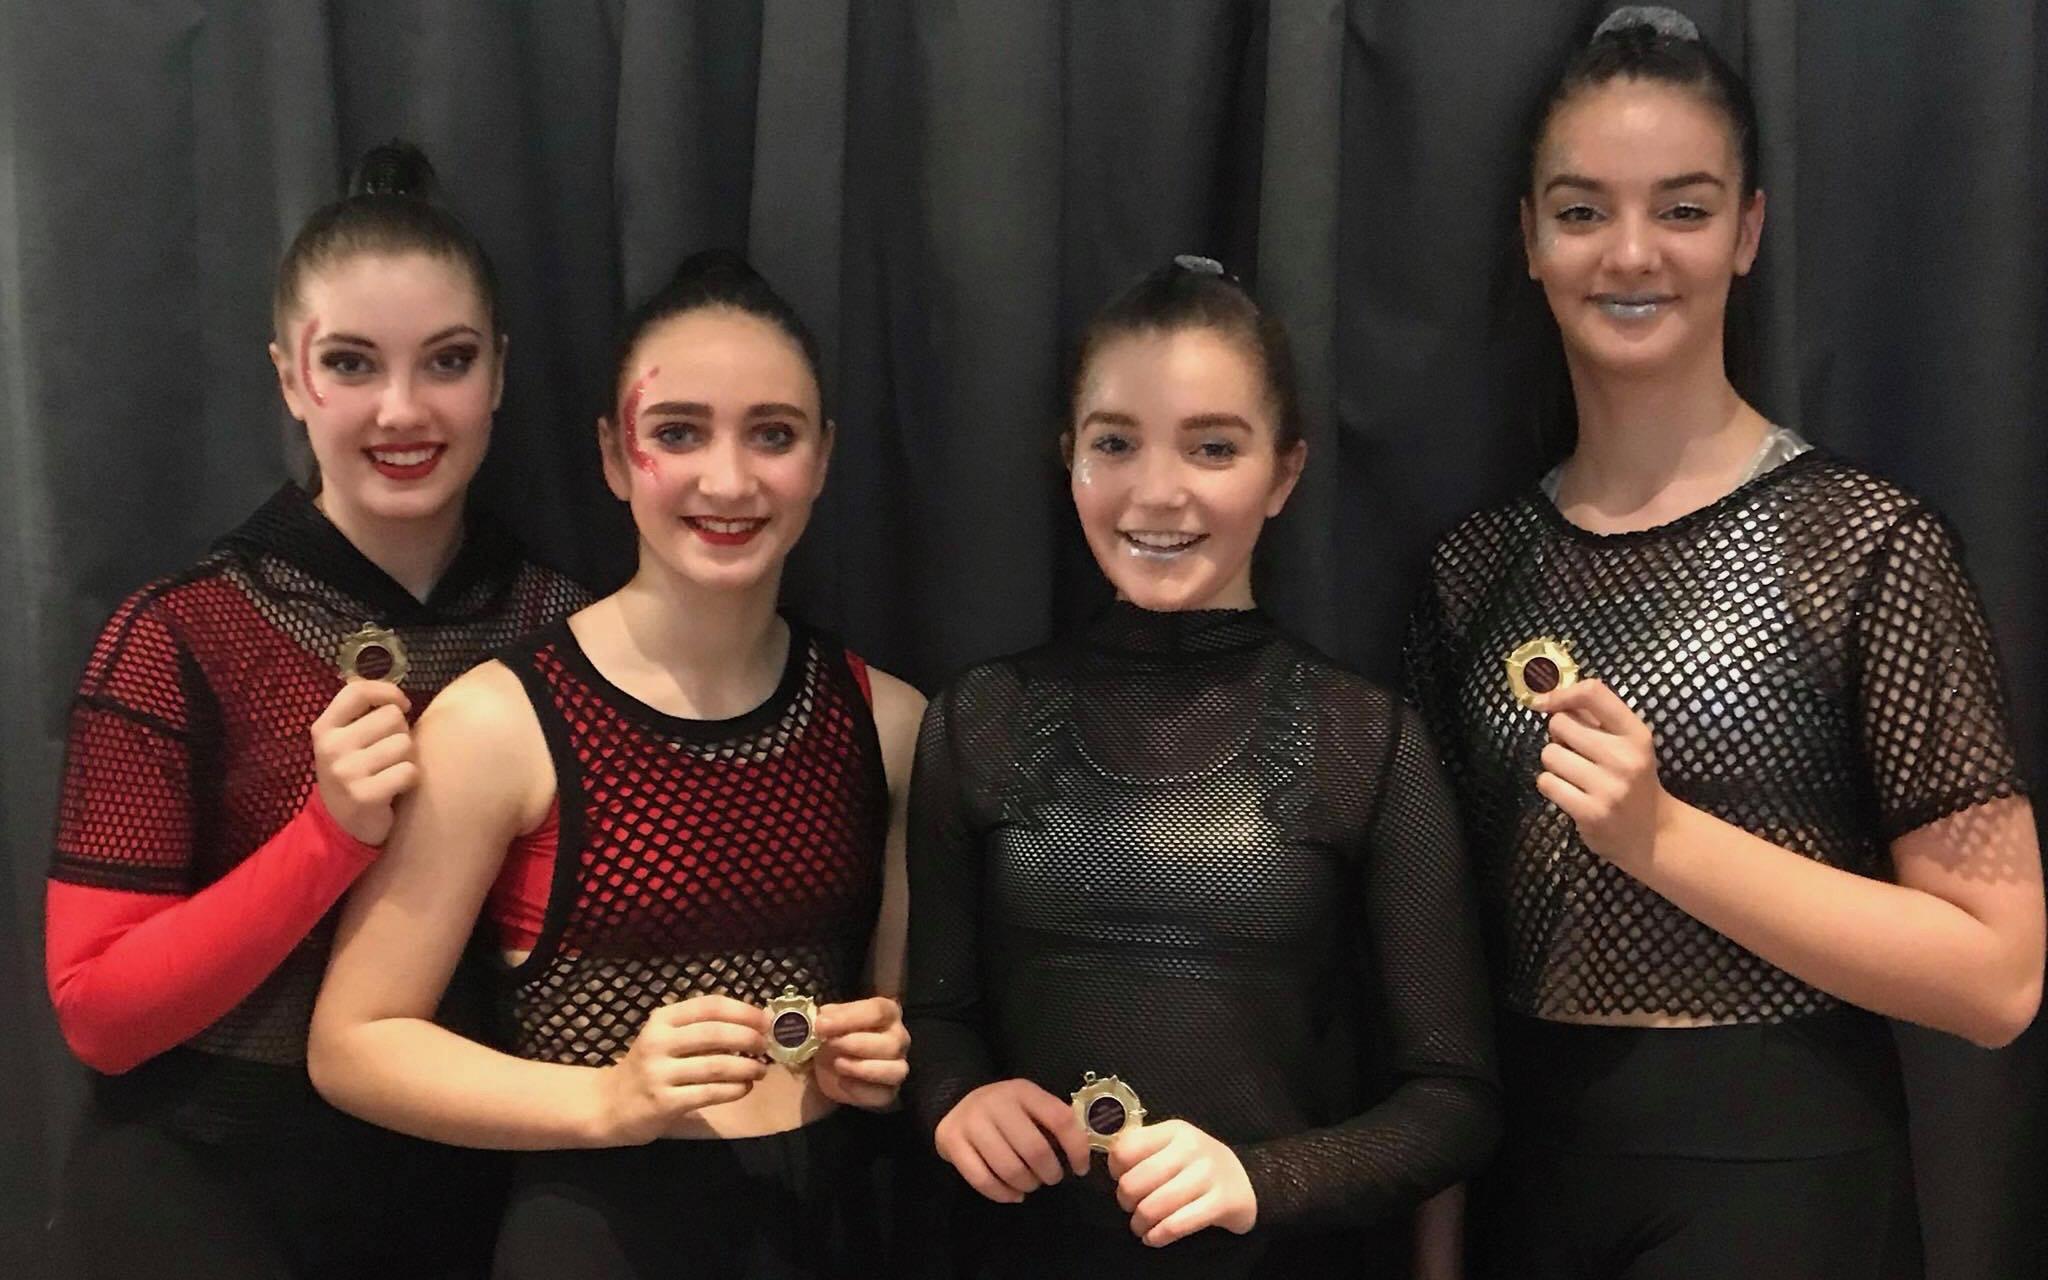 debs-dancers-tunbridge-wells-tap-quartet-joy-gracie-lucy-izzy-86-marks-first-choreo-sophie-huntley (1)